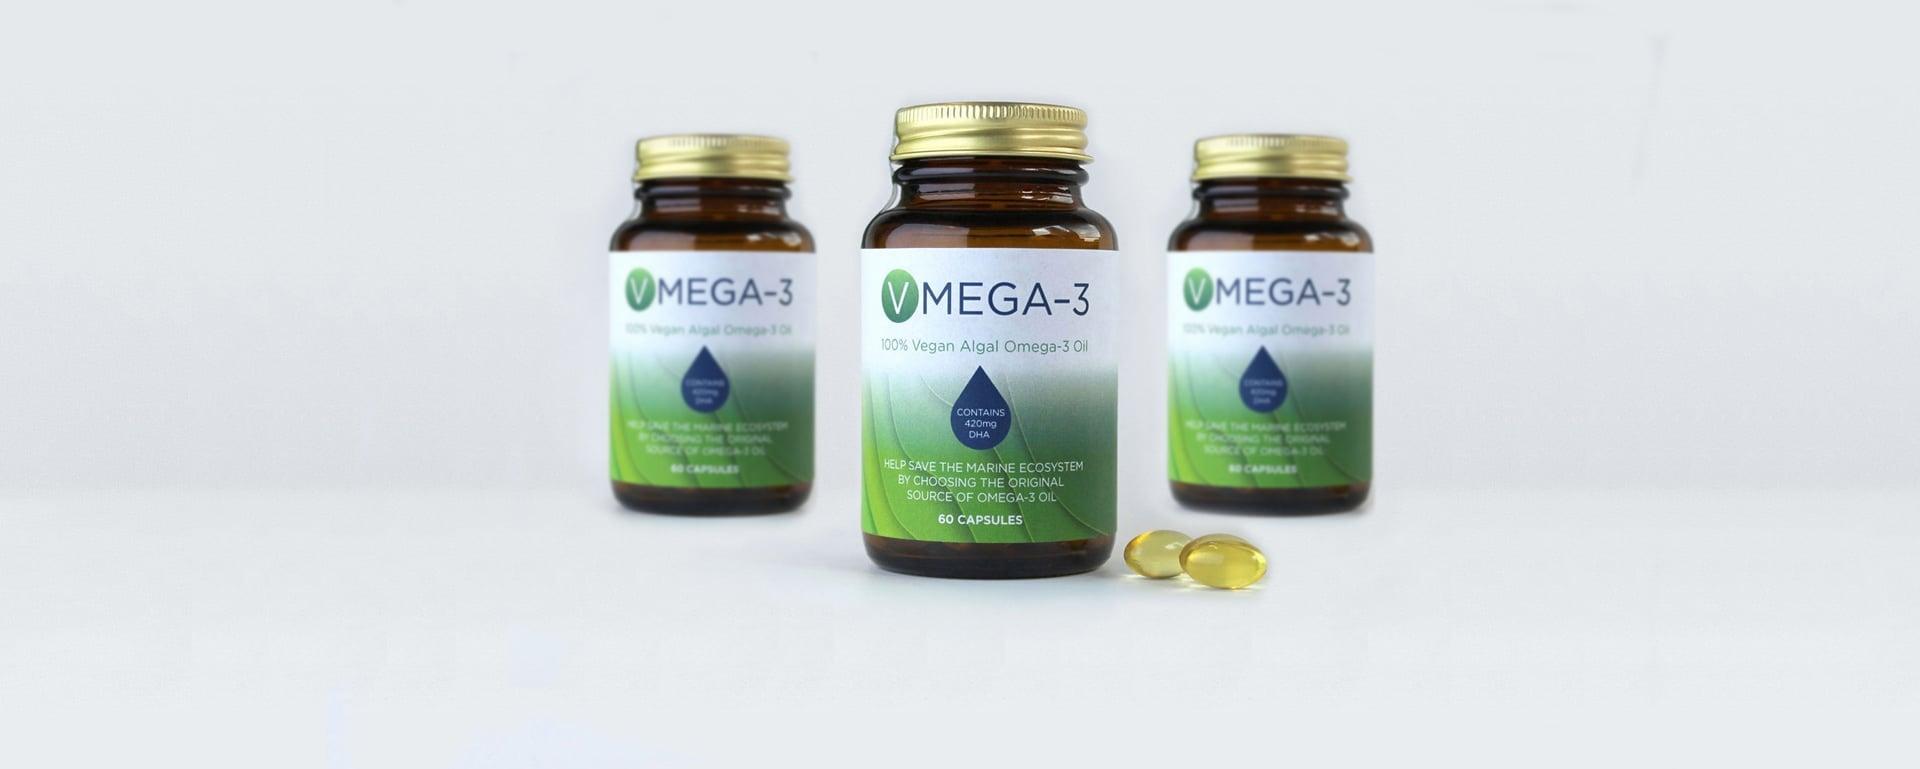 Vmega-3 Algal Oil The Purest Form Of Omega 3 Hero Shot